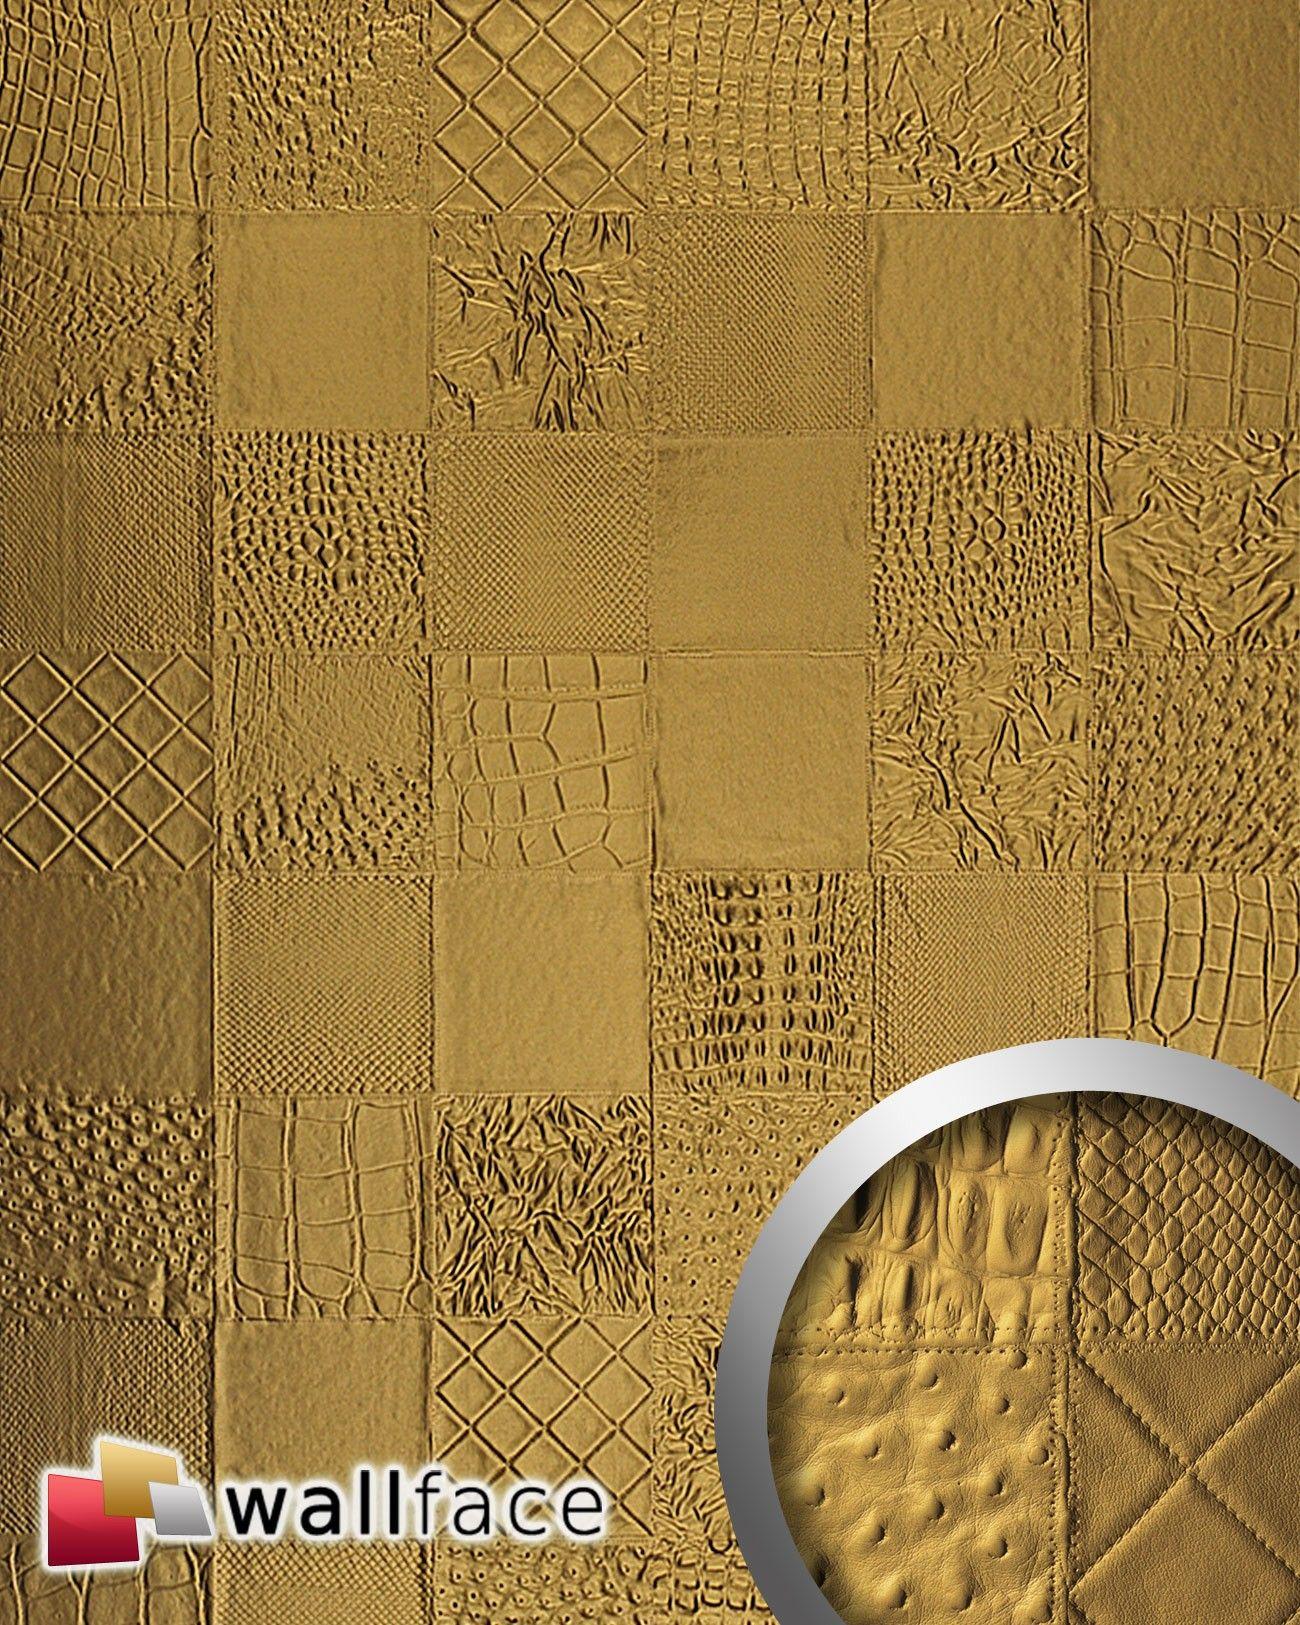 Wandpaneel Luxus 3d Leder Wallface 13926 Collage Blickfang Dekor Selbstklebende Tapete Wandverkleidung Gold 2 60 Qm Verkleidung Wande Selbstklebende Tapete Und Wandpaneele